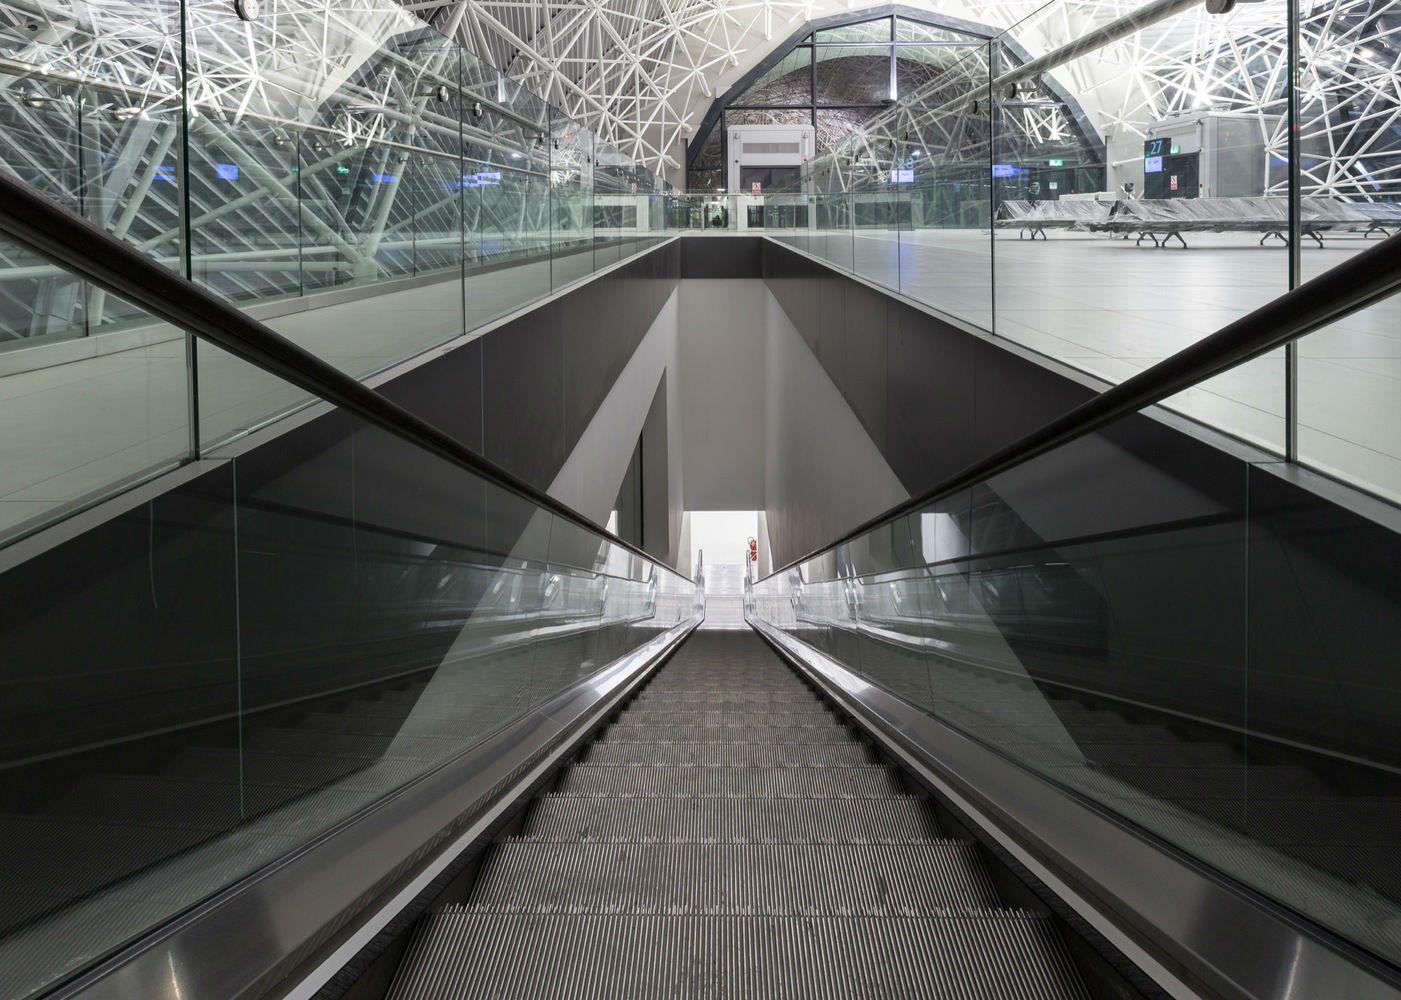 Zagreb Airport Kincl Neidhardt Institut Igh Arch2o Com Zagreb Airport City Croatia